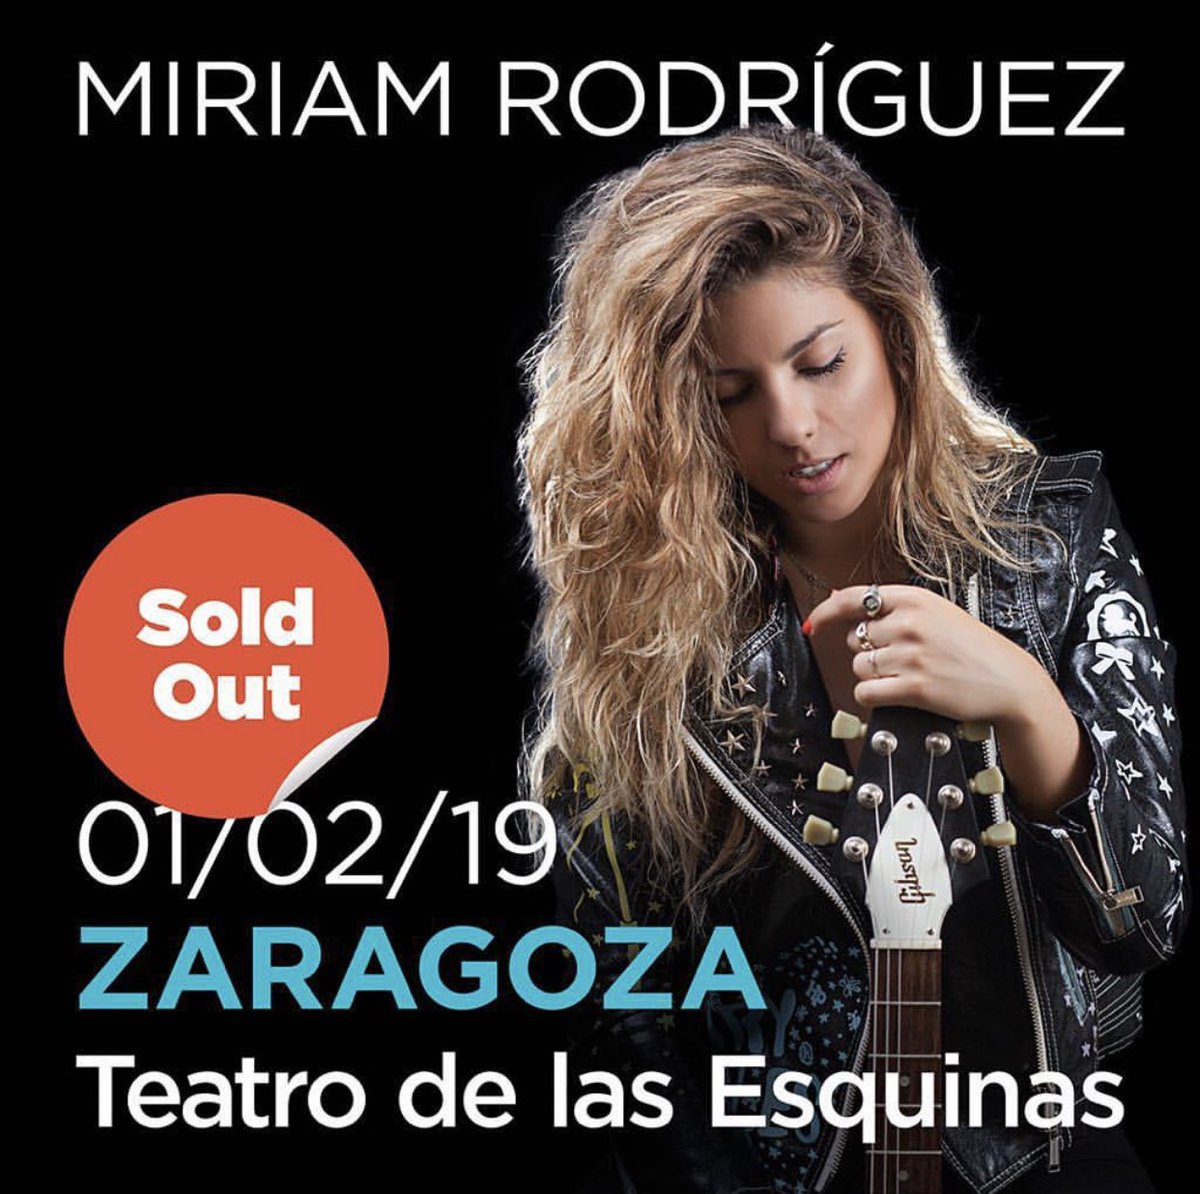 On On Cluboficial Twitter On Miriamr Twitter Twitter Miriamr On Miriamr Miriamr Cluboficial Cluboficial Cluboficial HW2e9IEDY